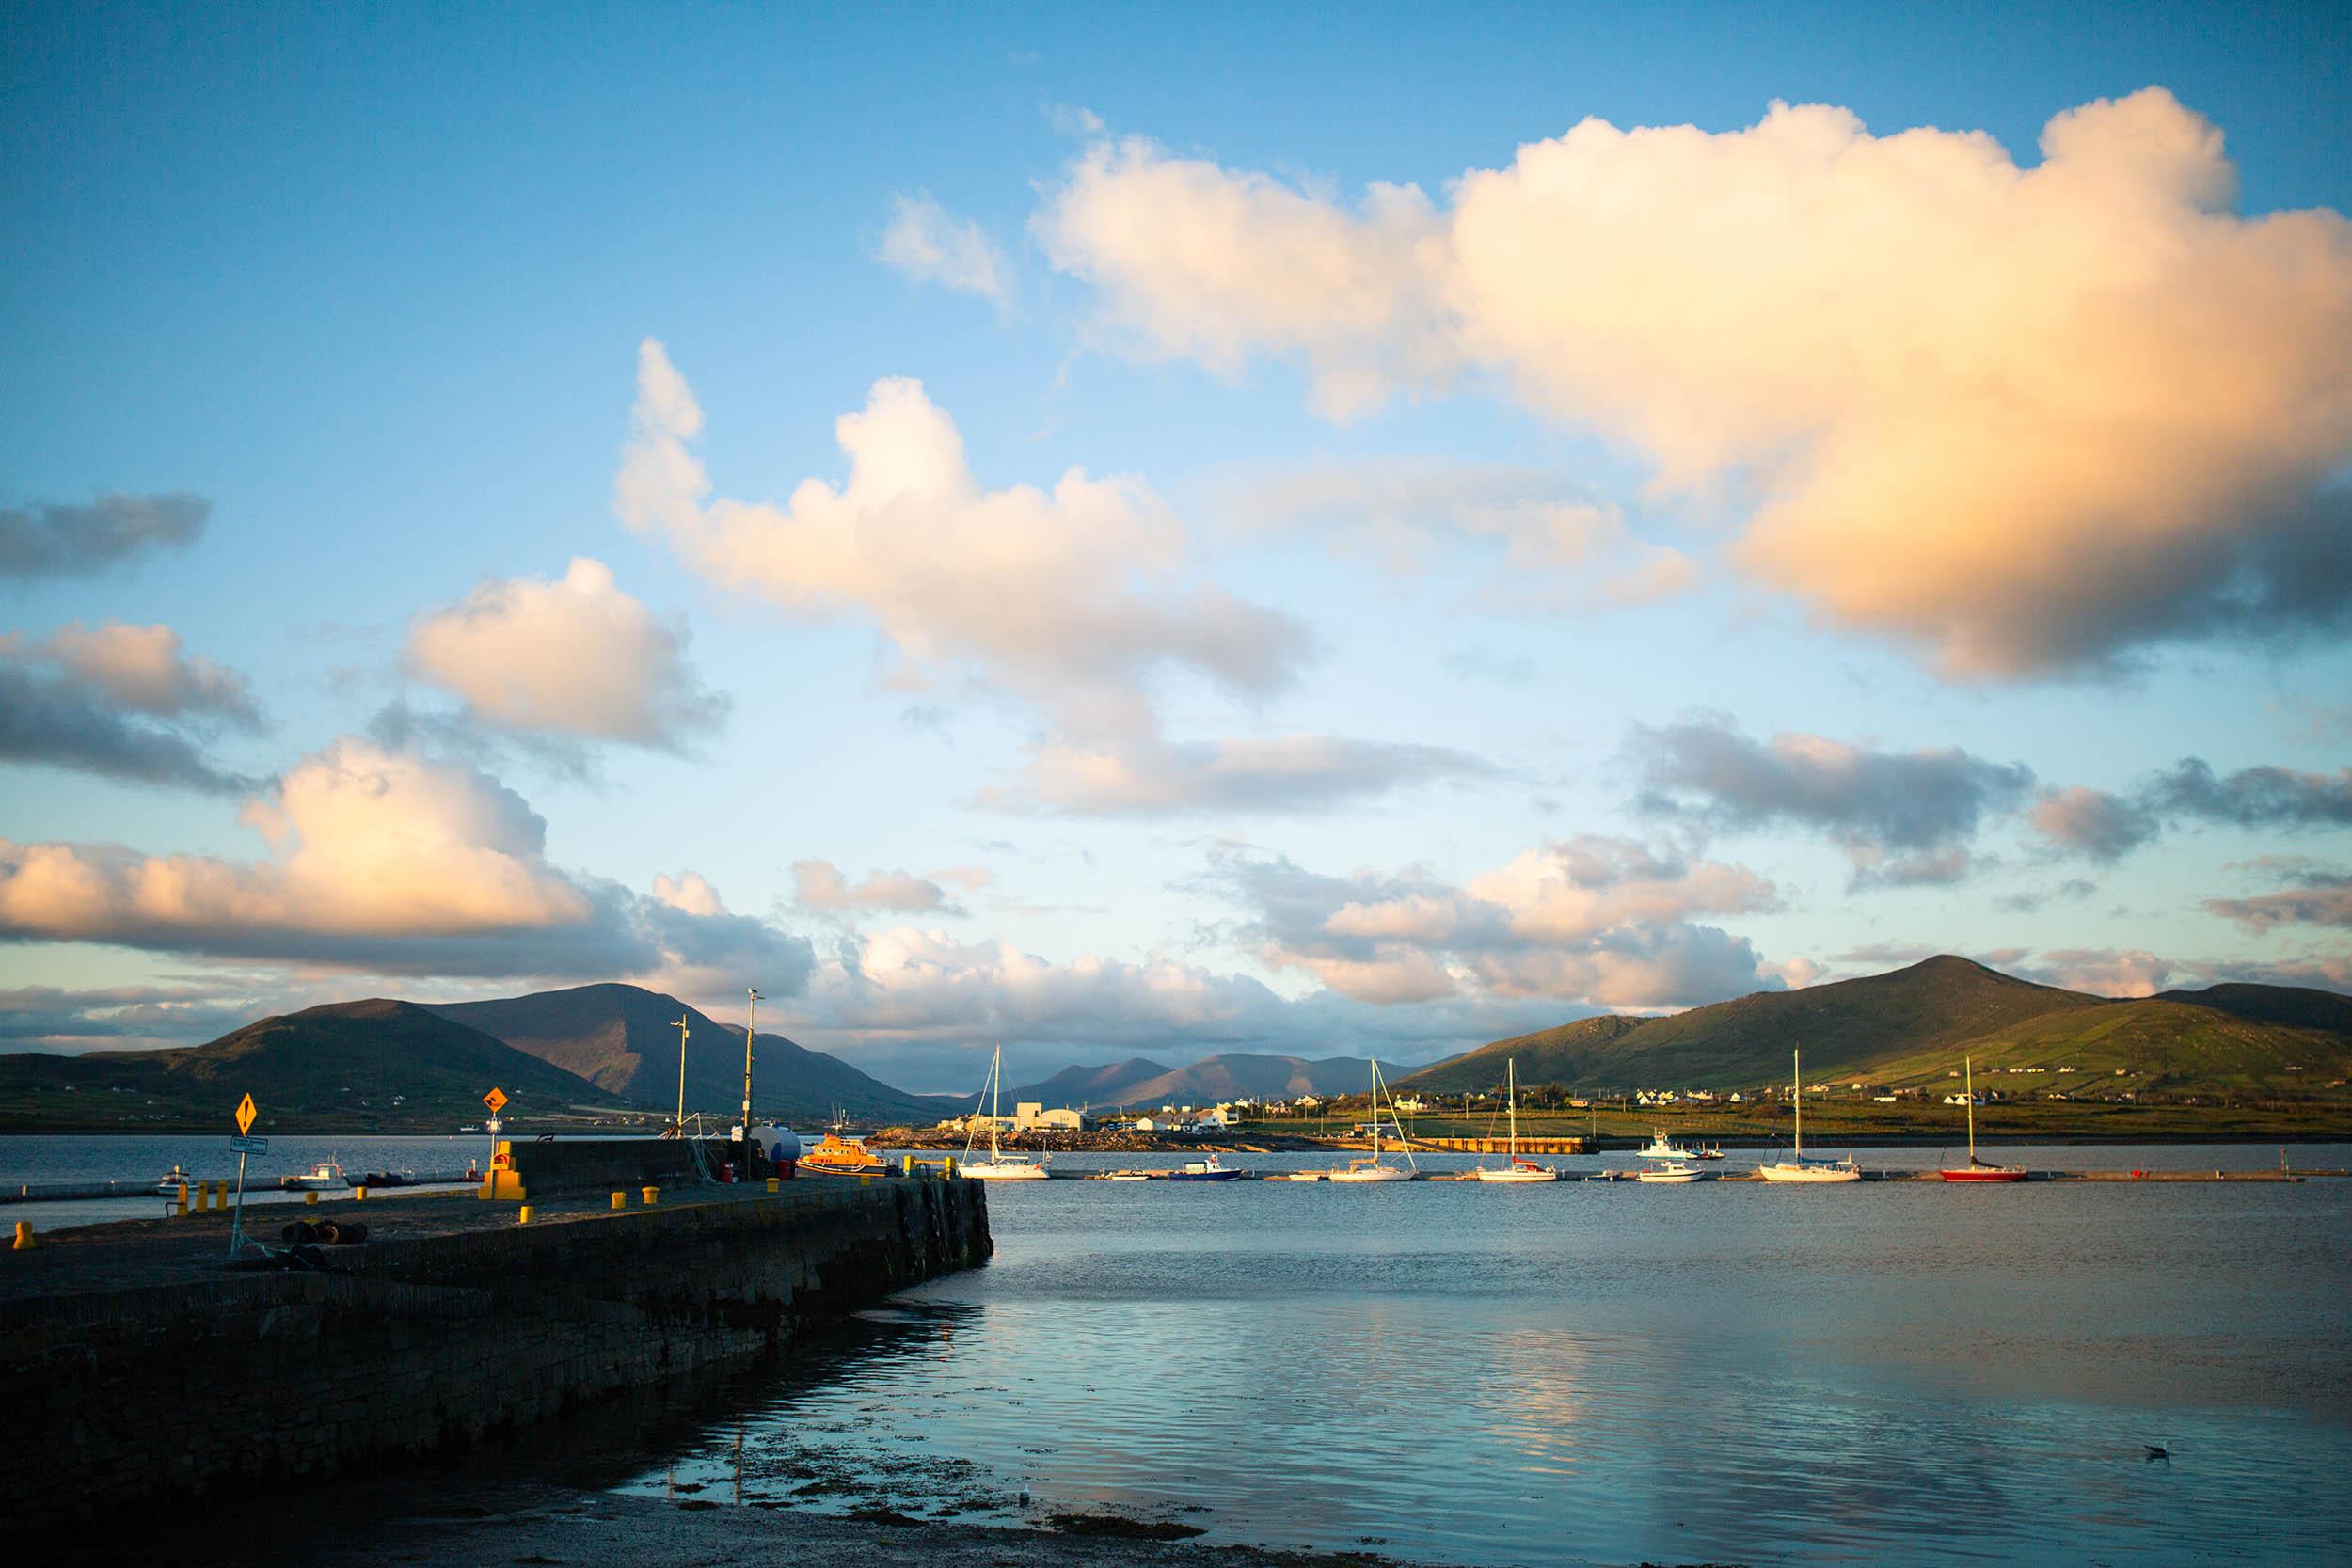 IRELAND_KERRY_VALENTIAISLAND_0018